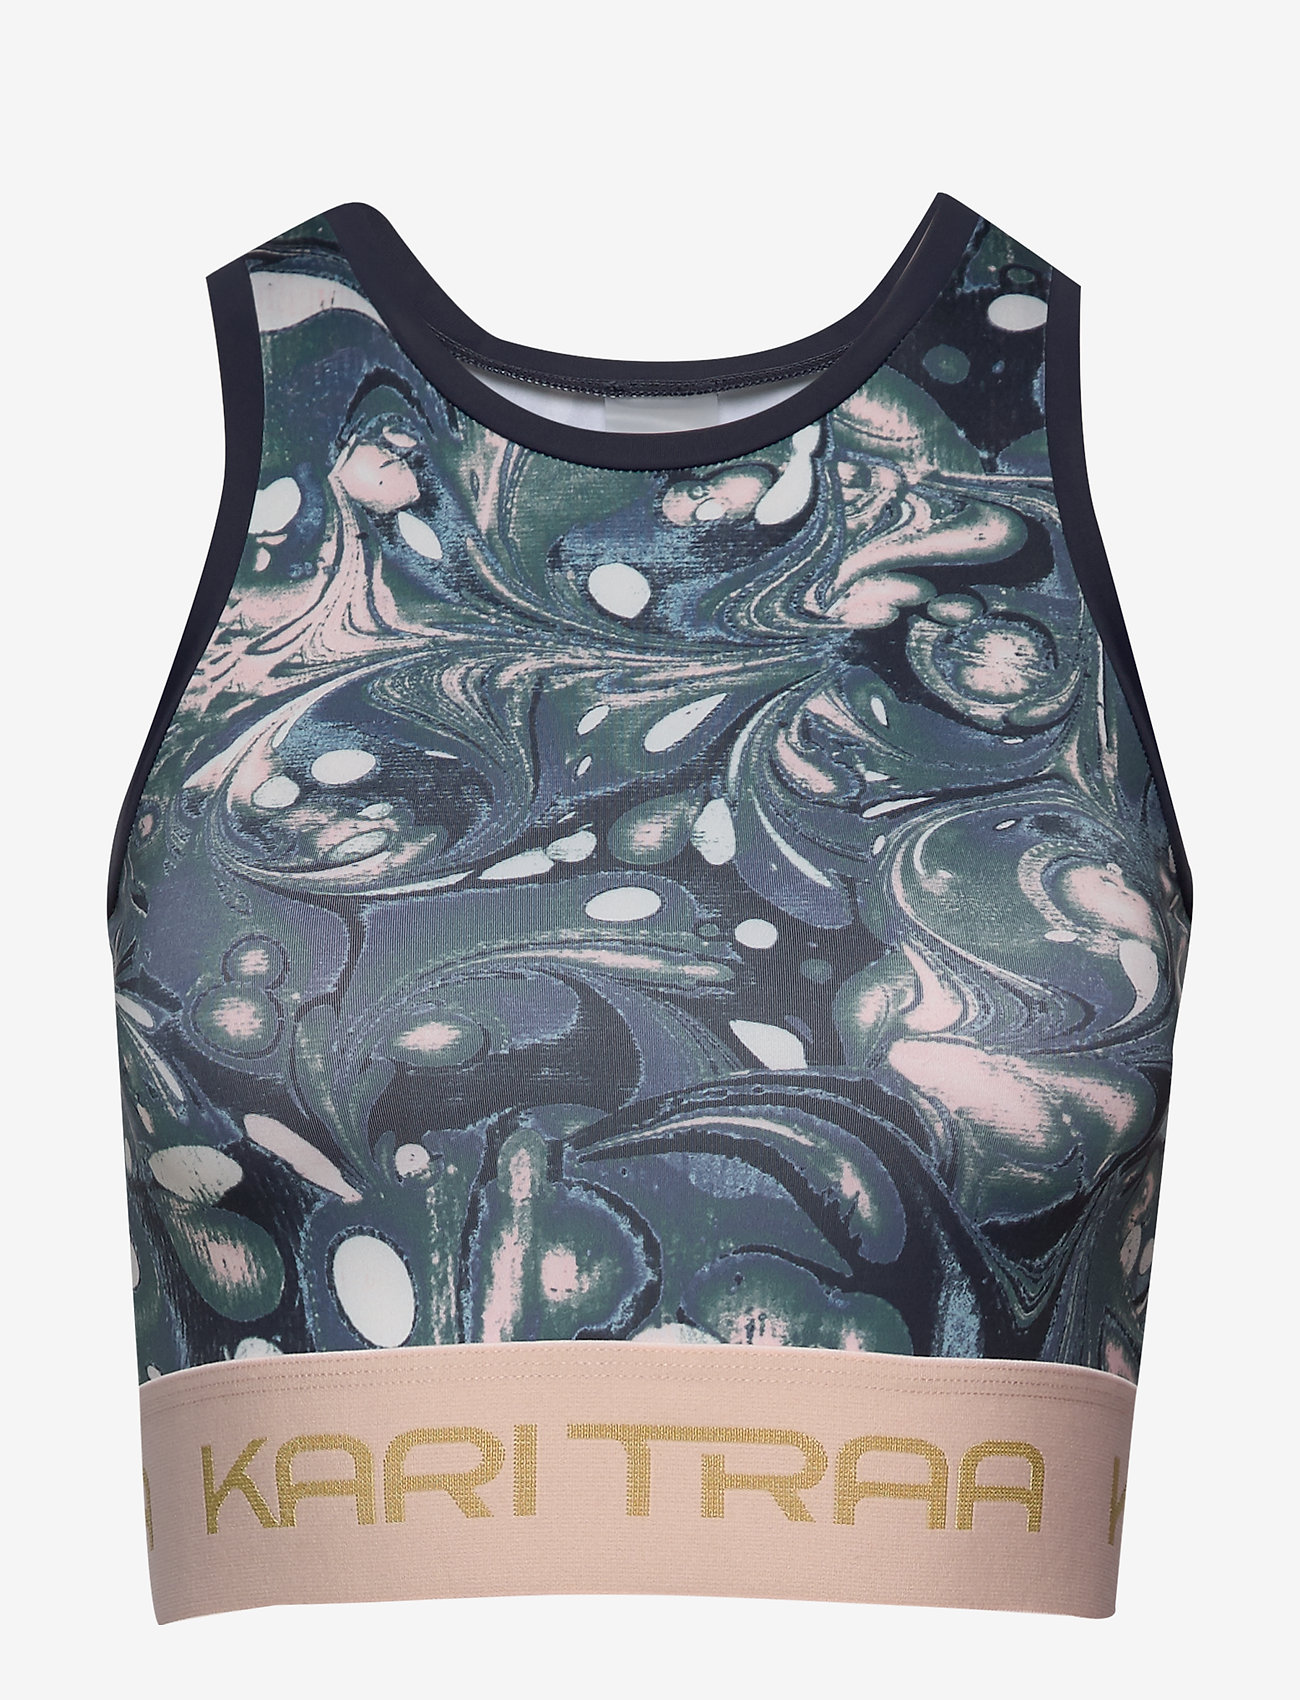 Kari Traa BEATRICE TOP - T-shirts & topper MARIN - Dameklær Spesialtilbud